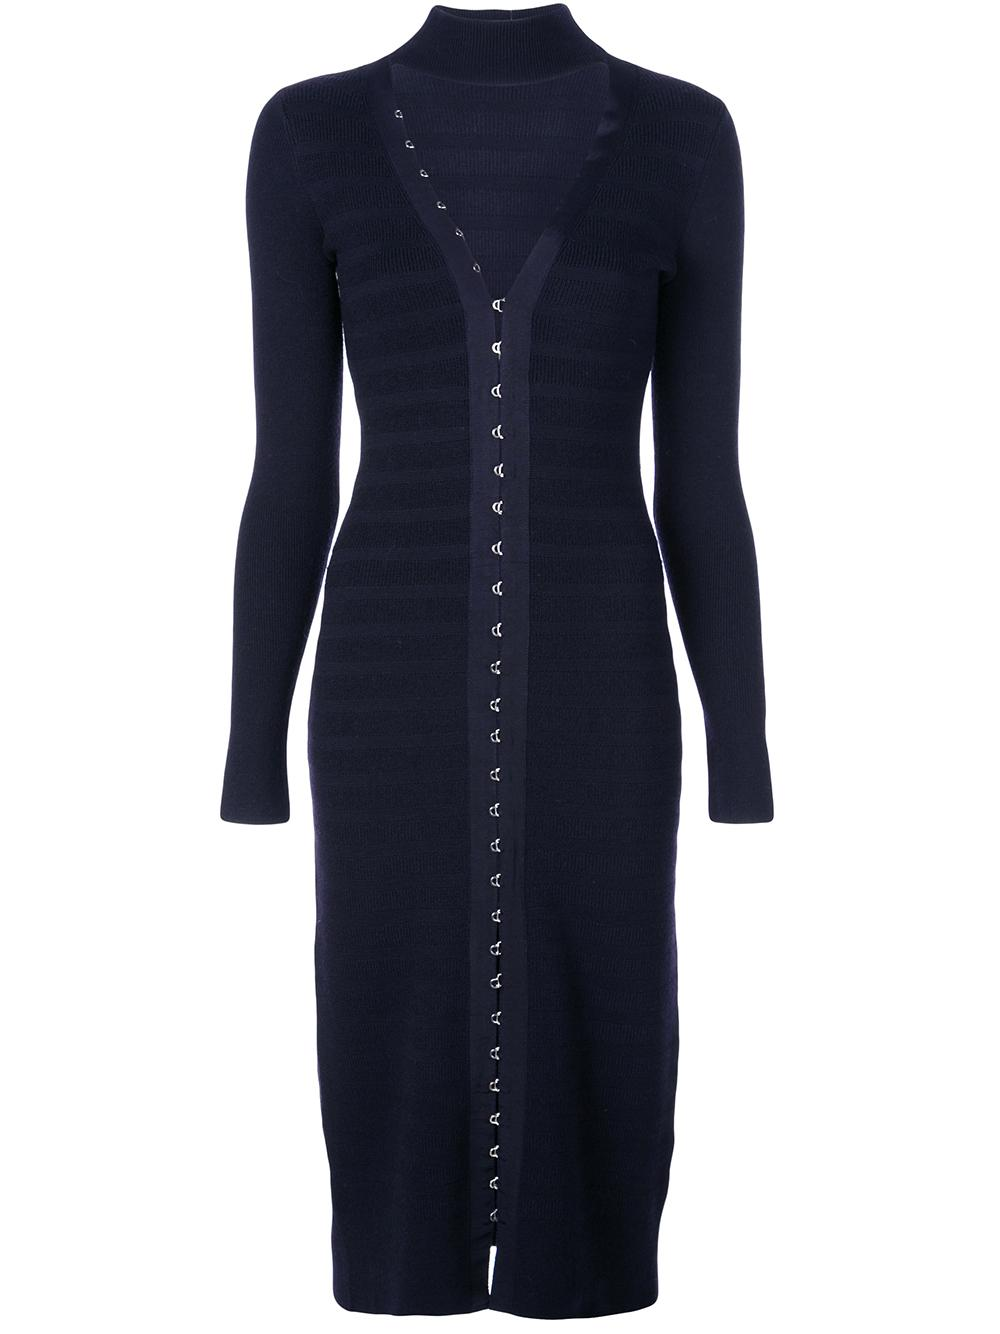 Long Sleeve Textured Hook Eye Slit Front Dress Item # 419-1001-K